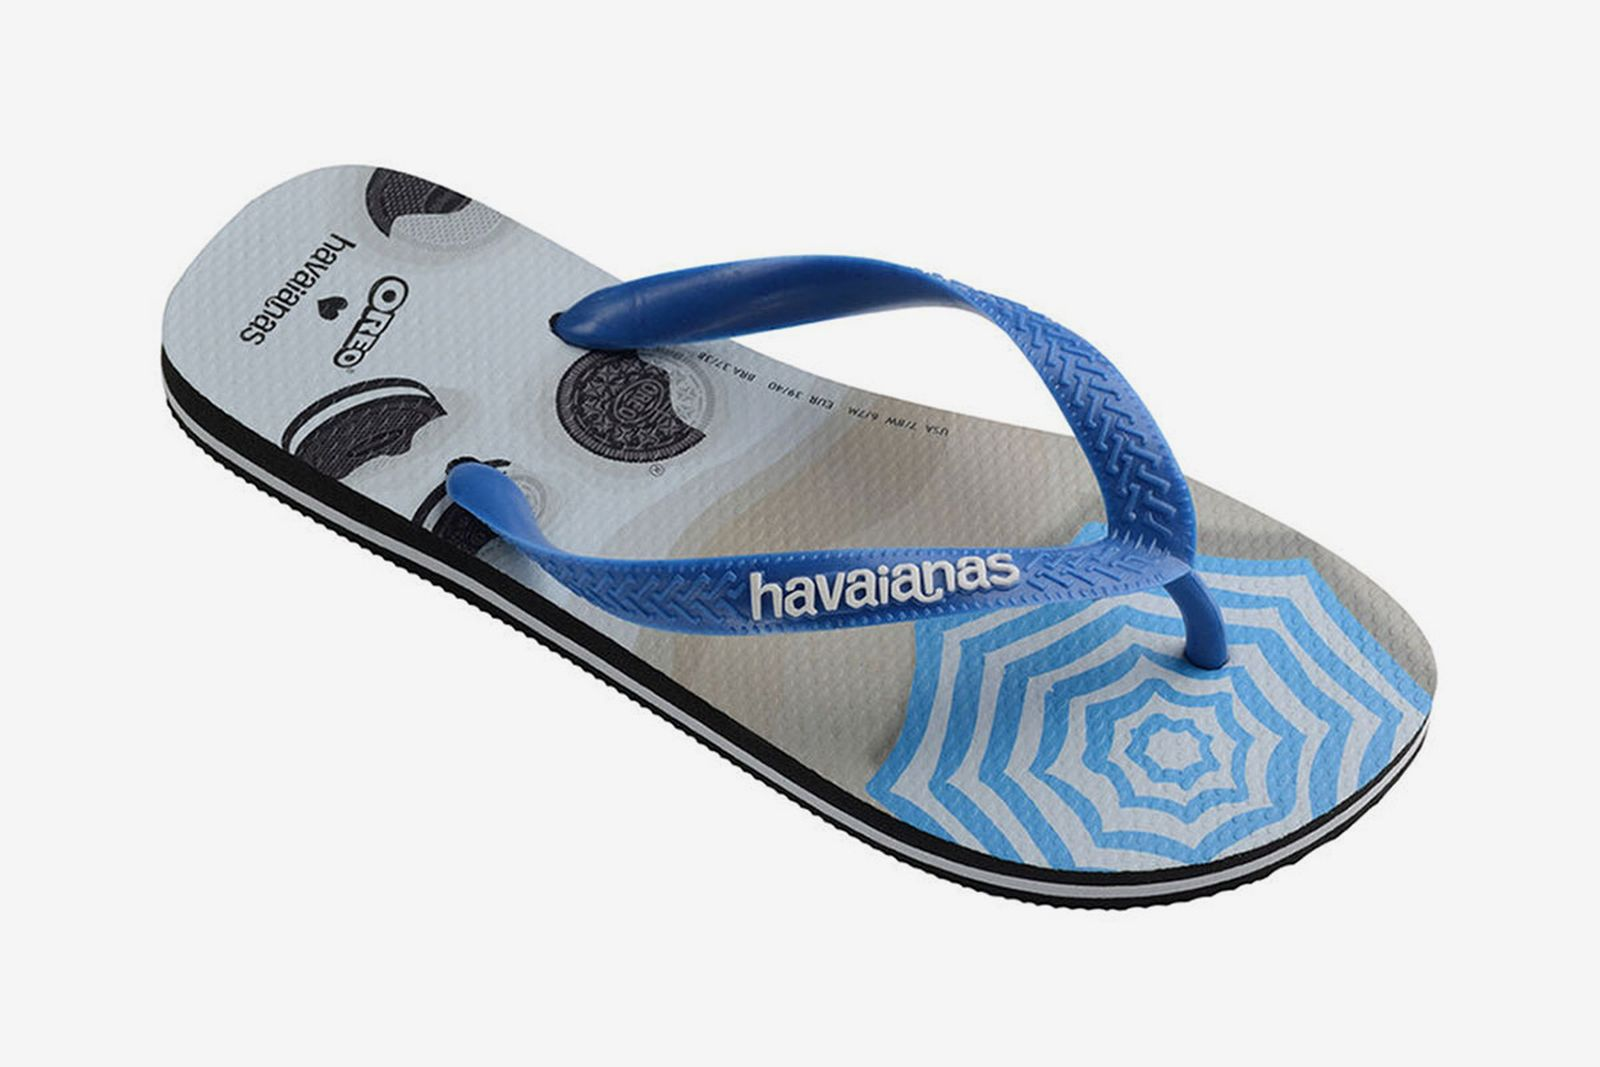 oreo-havaianas-flip-flops-01